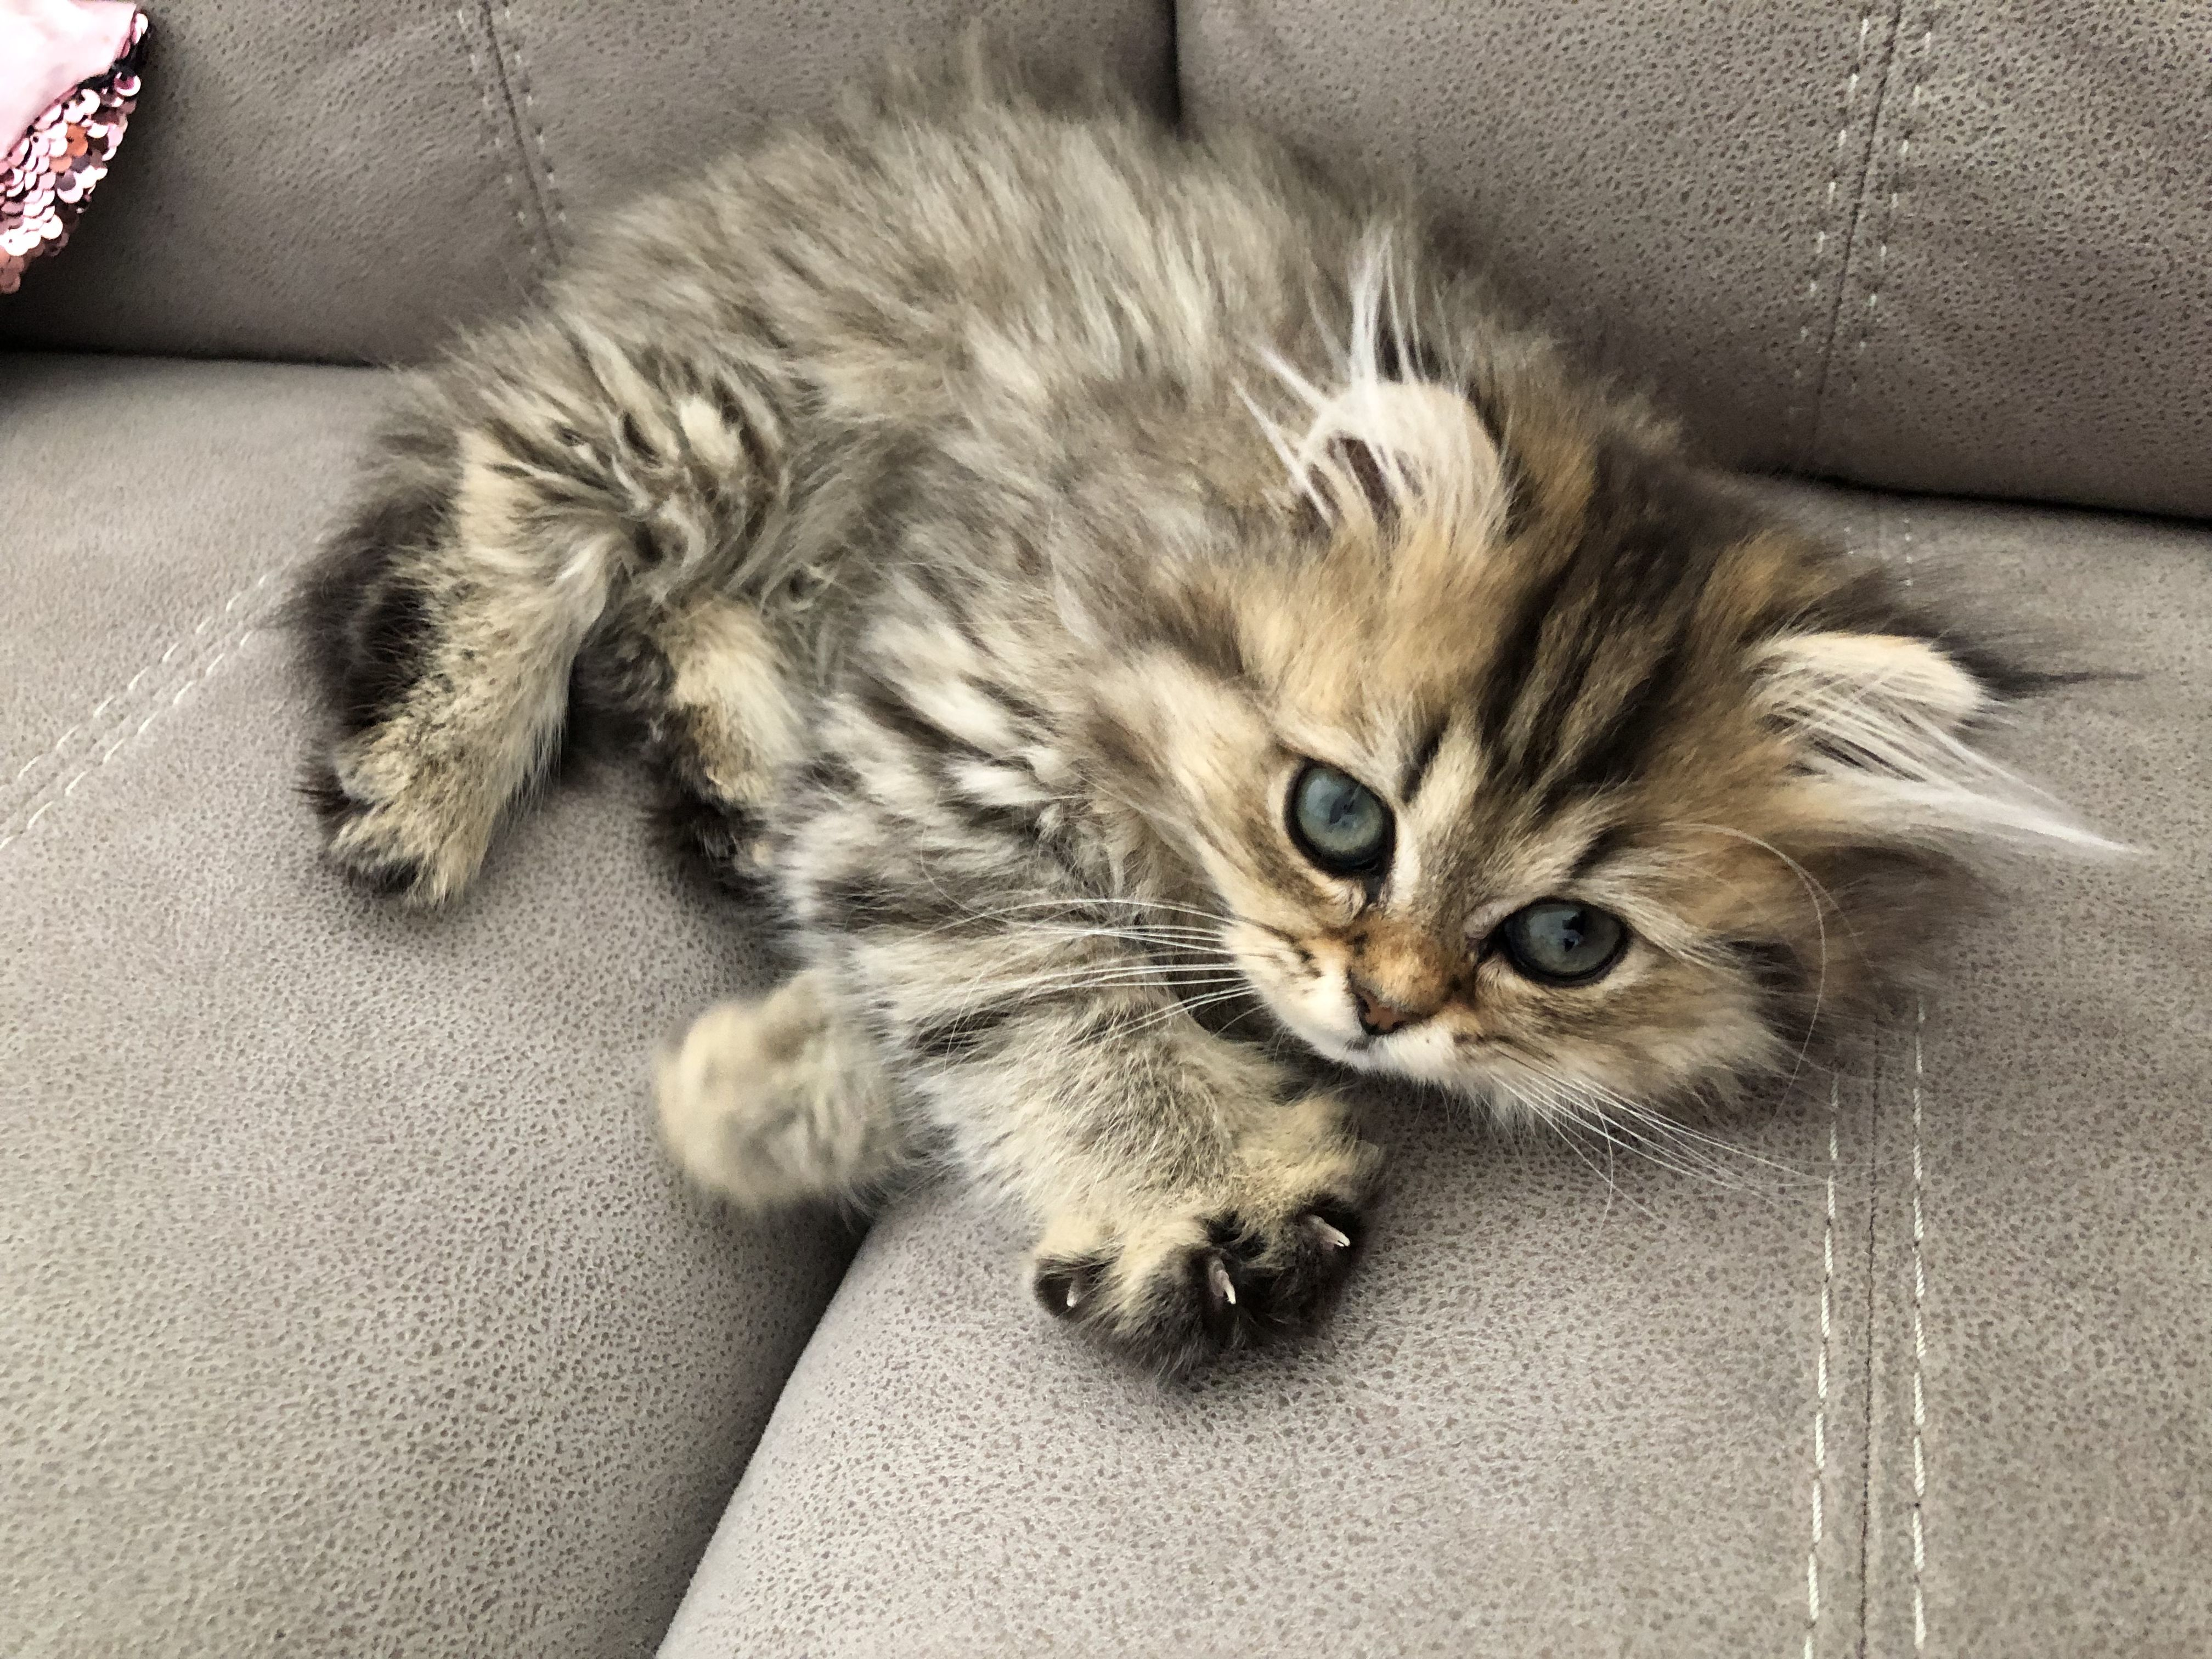 Pin By Shibra K On Pickles An Adorable Kitten Adorable Kitten Kitten Animals